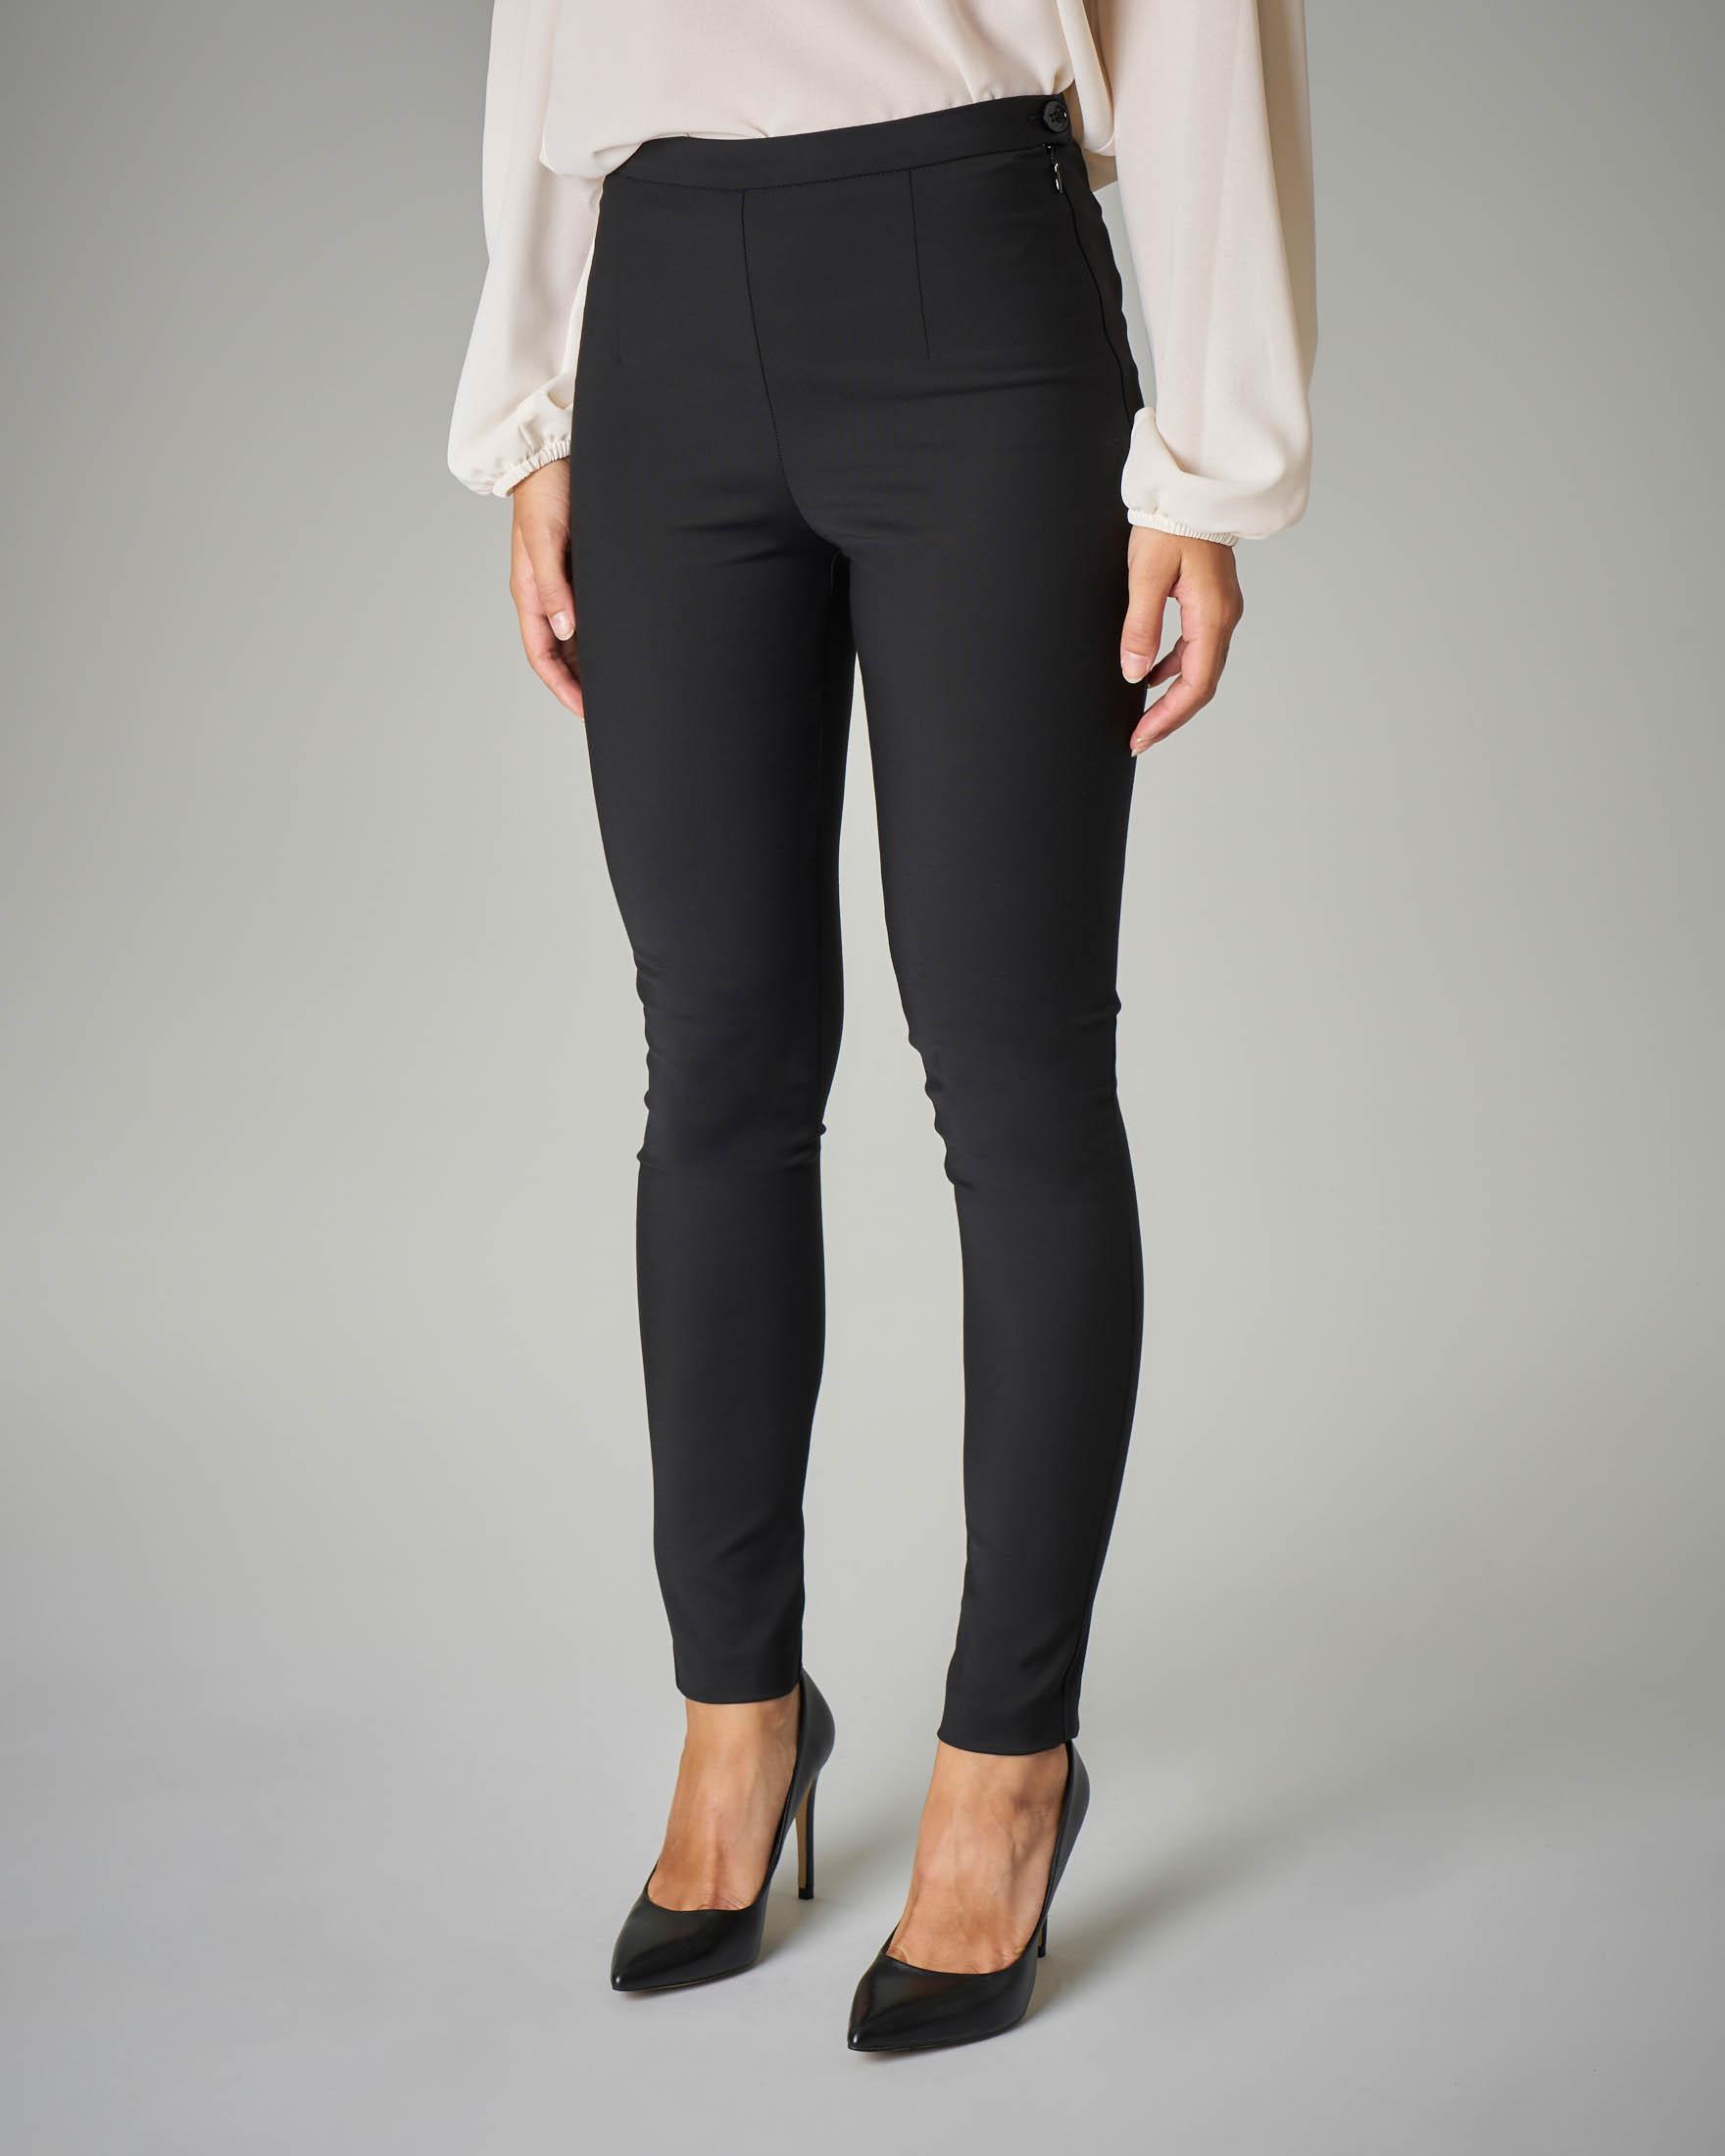 Pantalone nero skinny stretch a vita alta